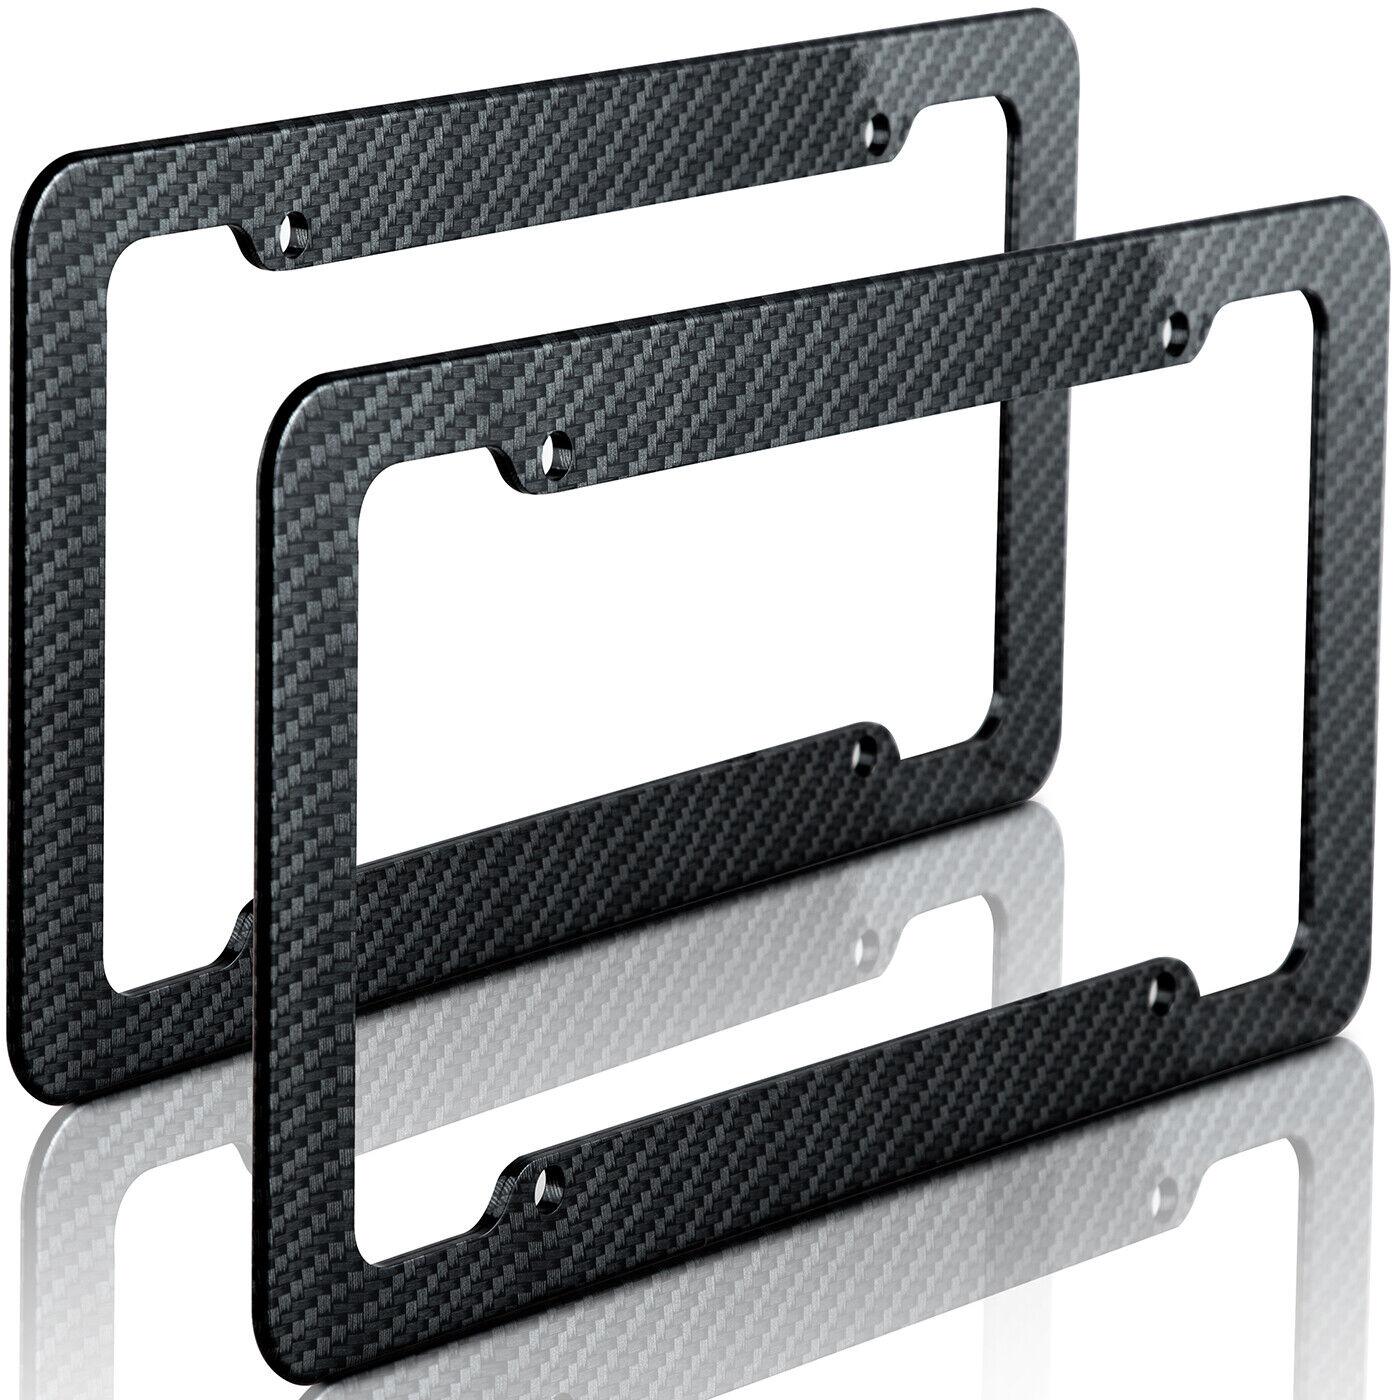 2pc Plastic Carbon Fiber Style OxGord License Plate Frames for Auto-Car-Truck-A